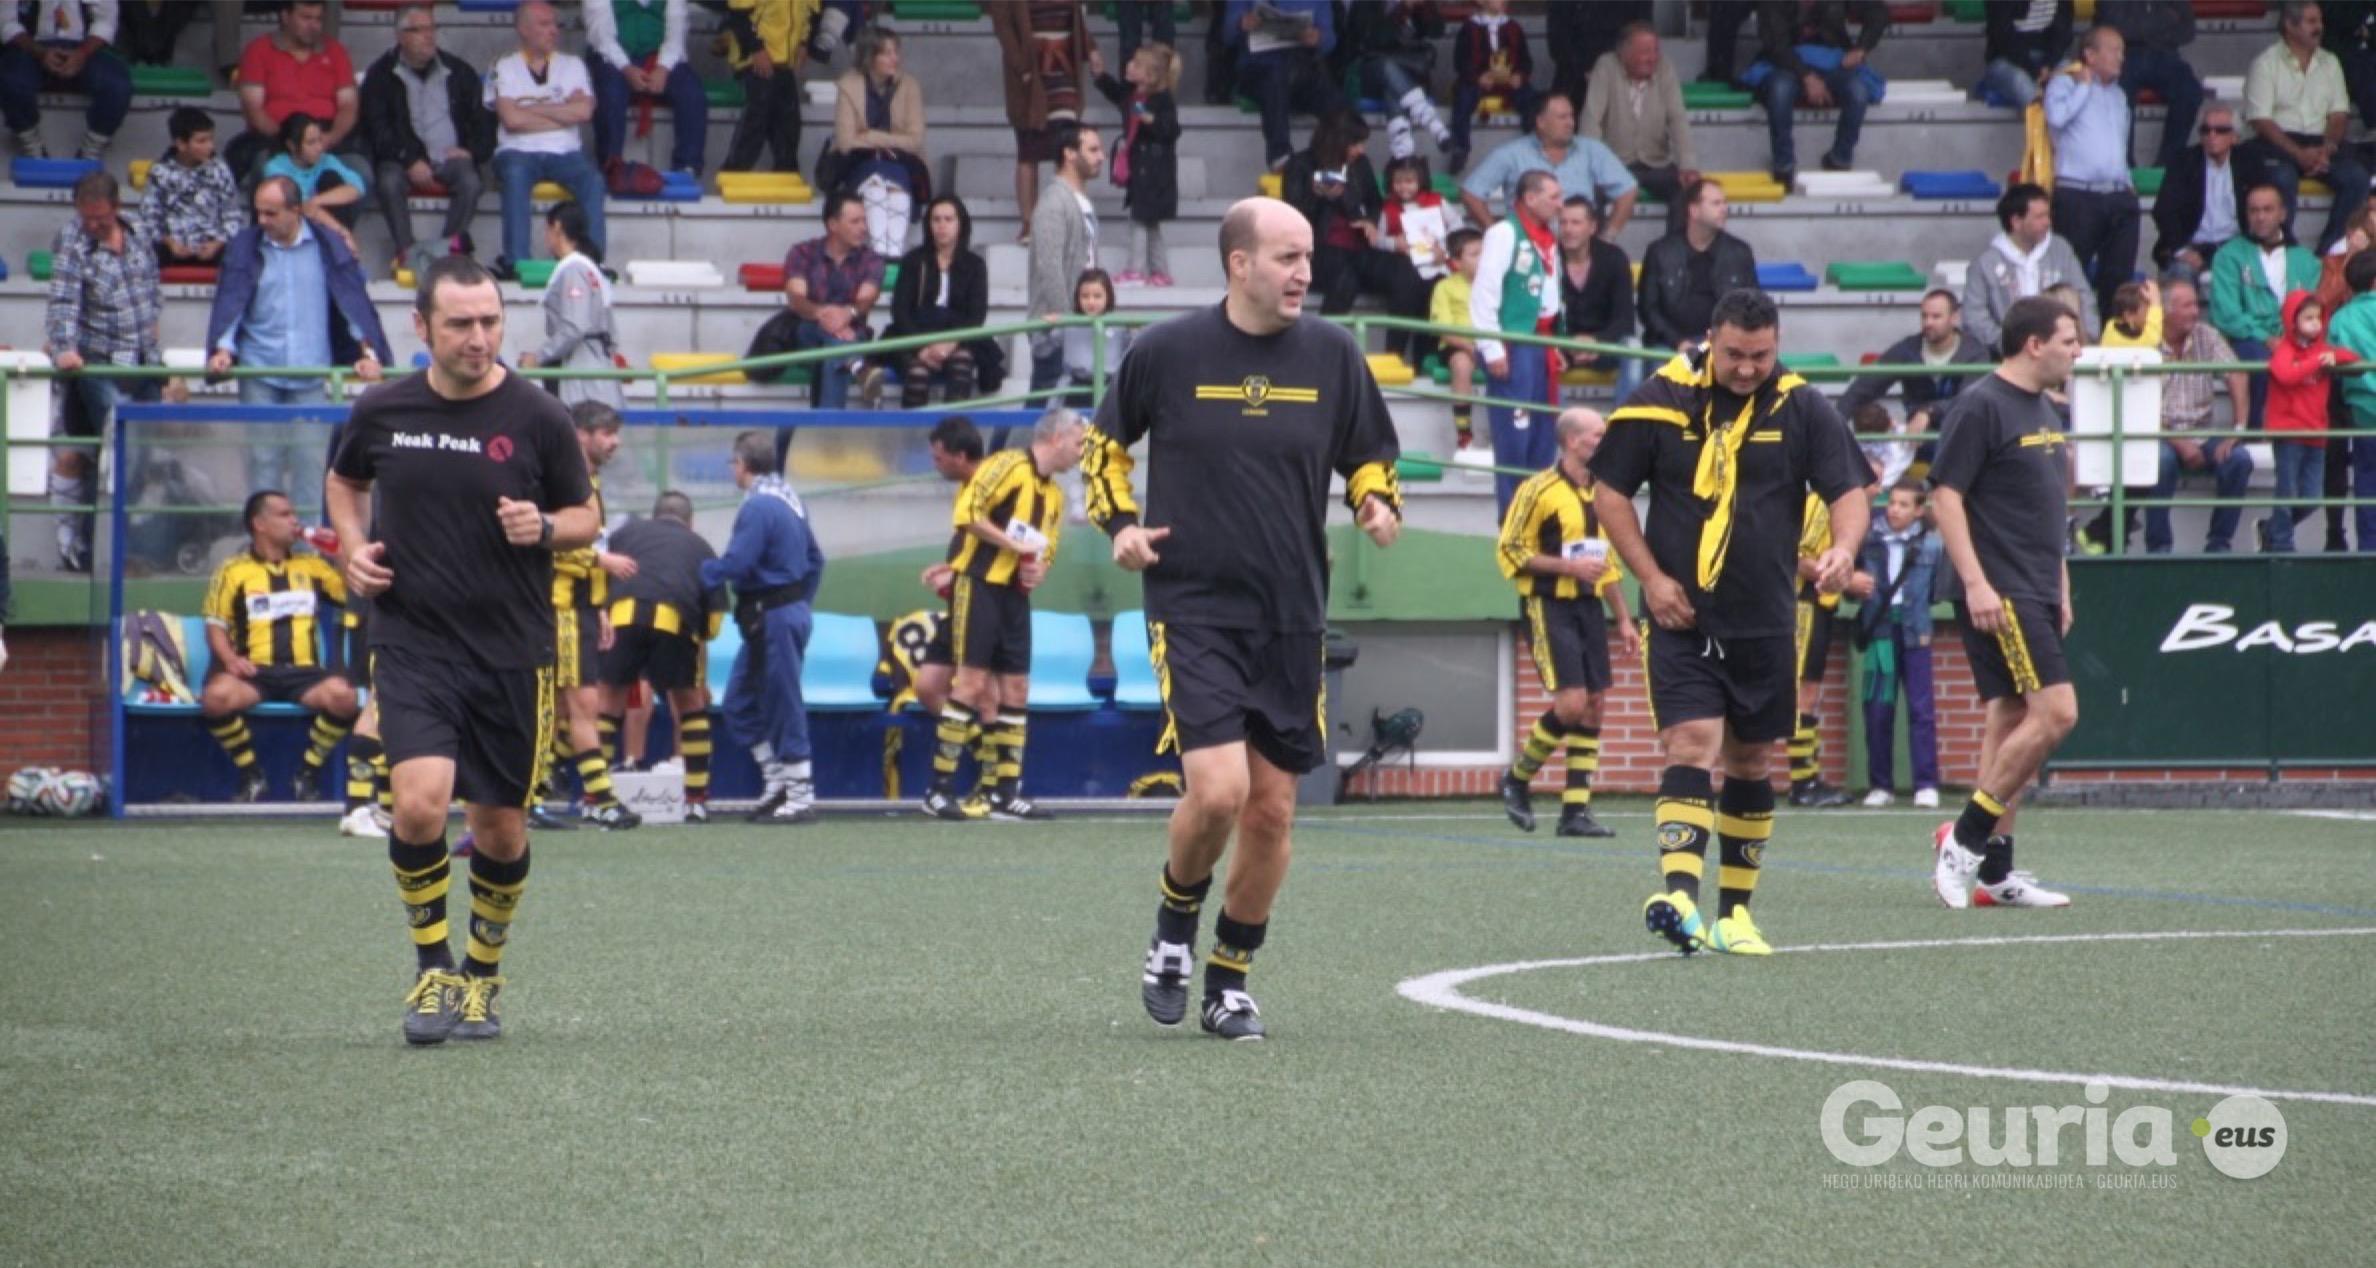 basauri_san_fausto_2015_futbol_basconia_beteranoak_8